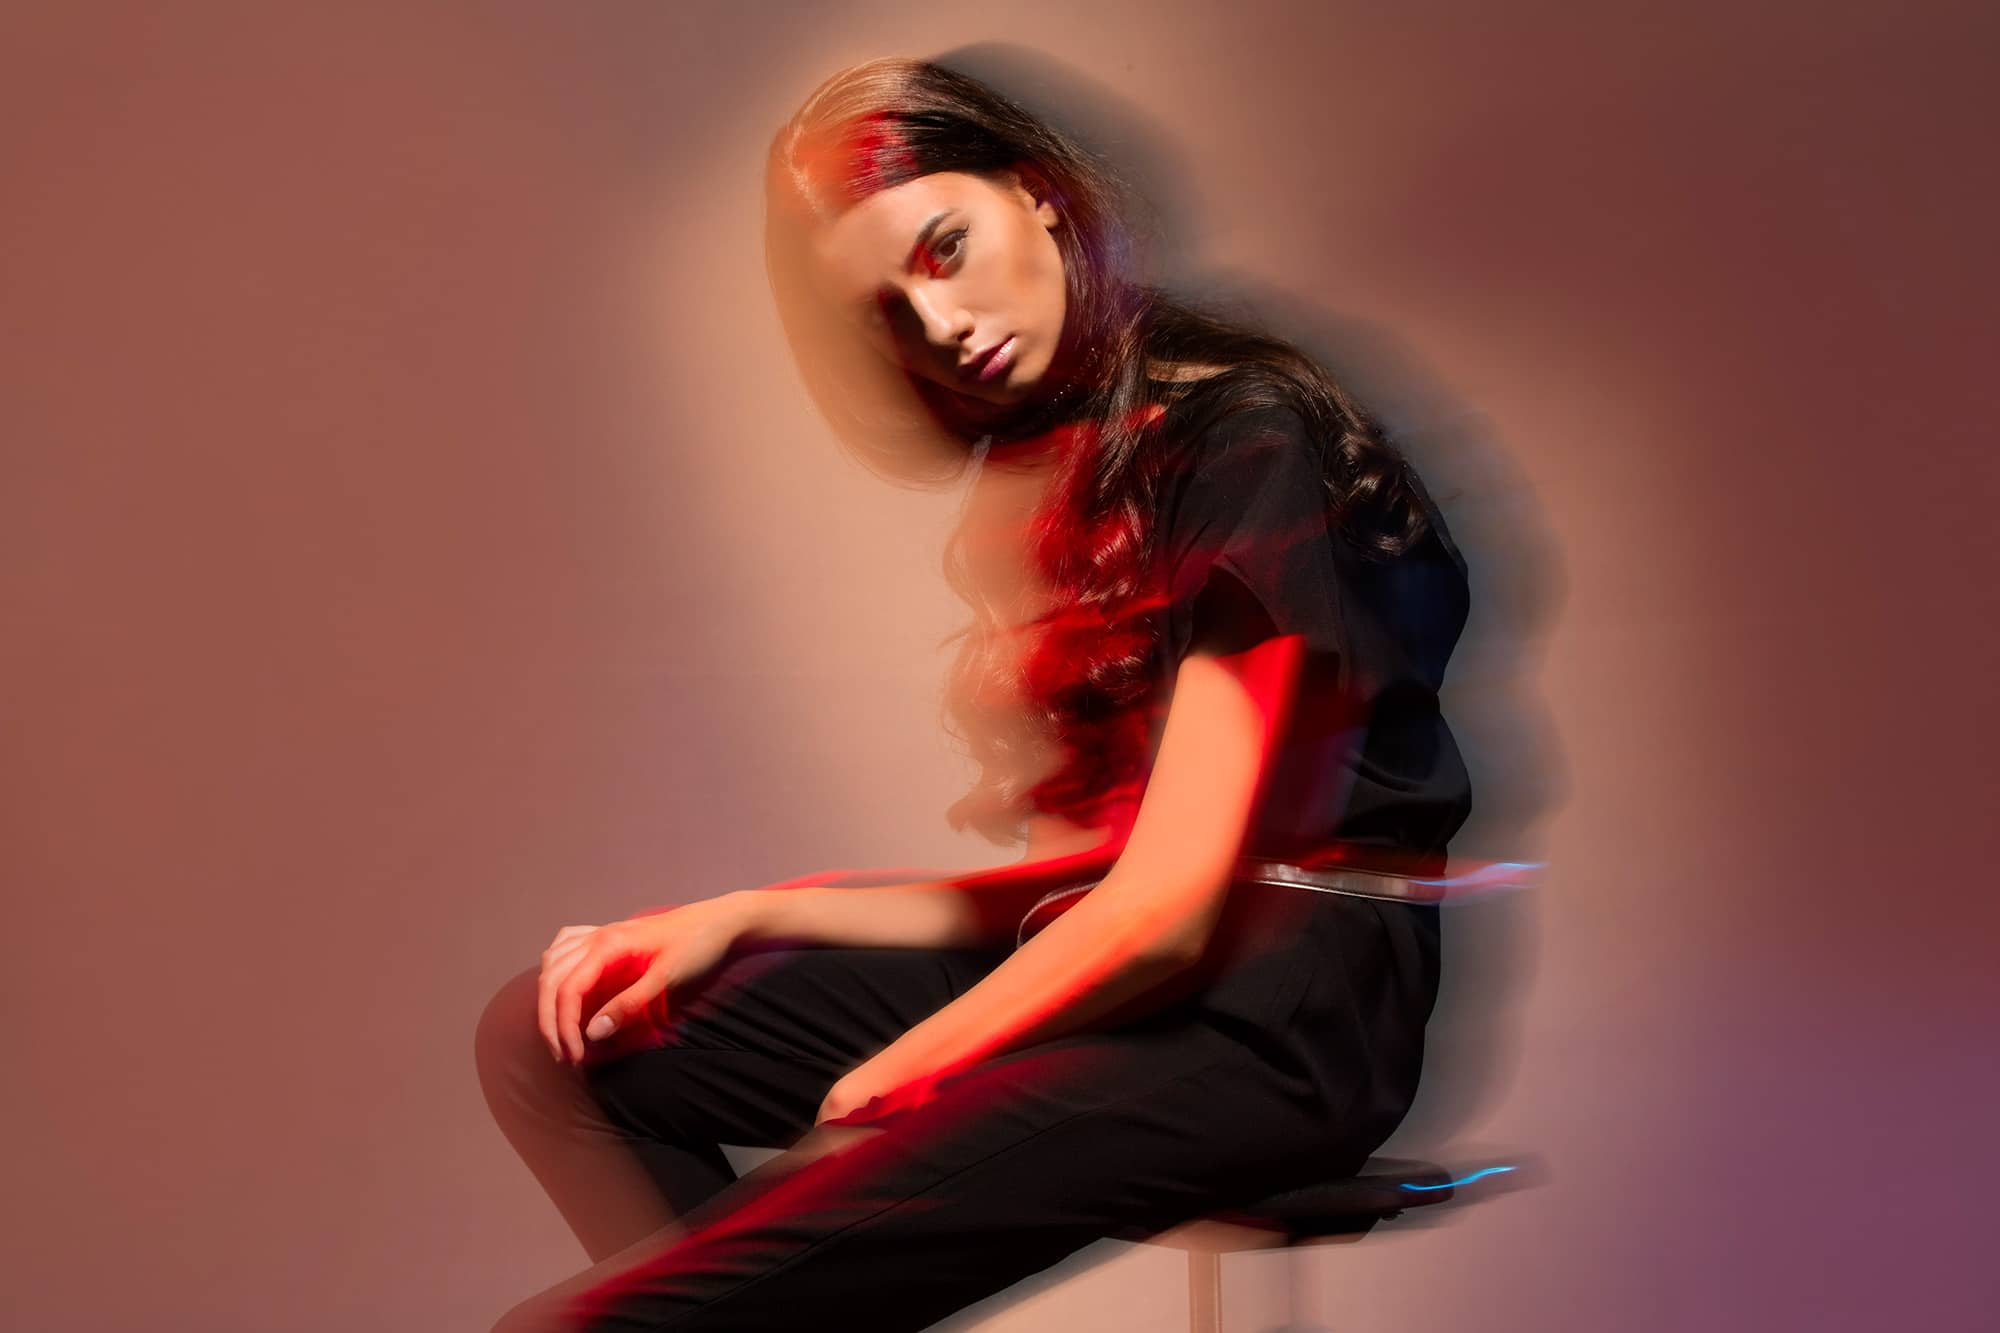 Fashion fotografie by Fotostudio Zandvoort\